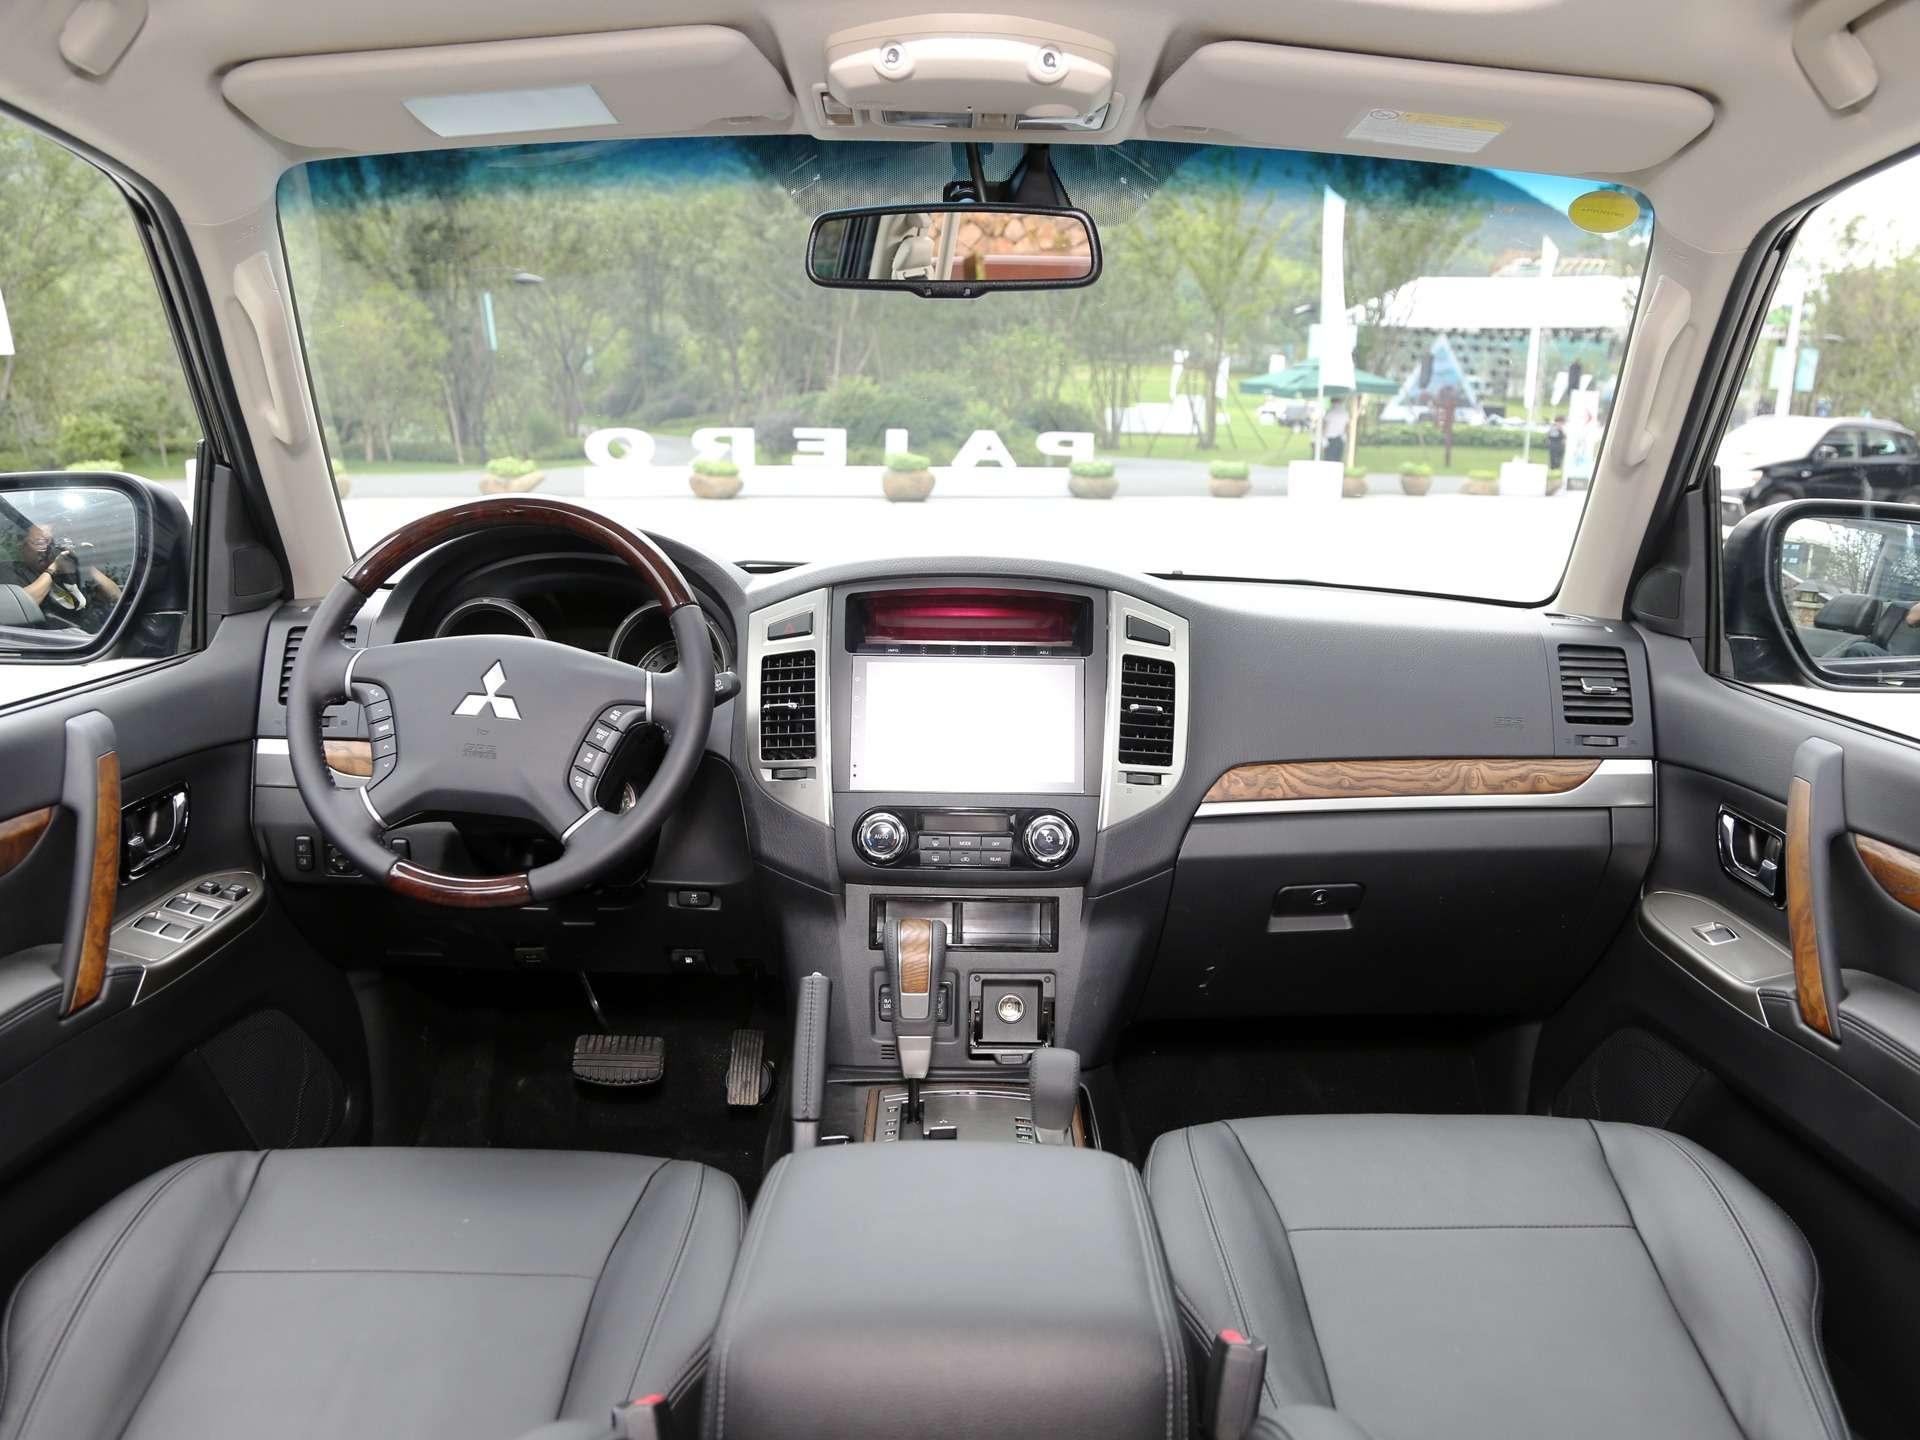 Mitsubishi Pajero IV: вечно молодой, нотеперь золотой!— фото 883535